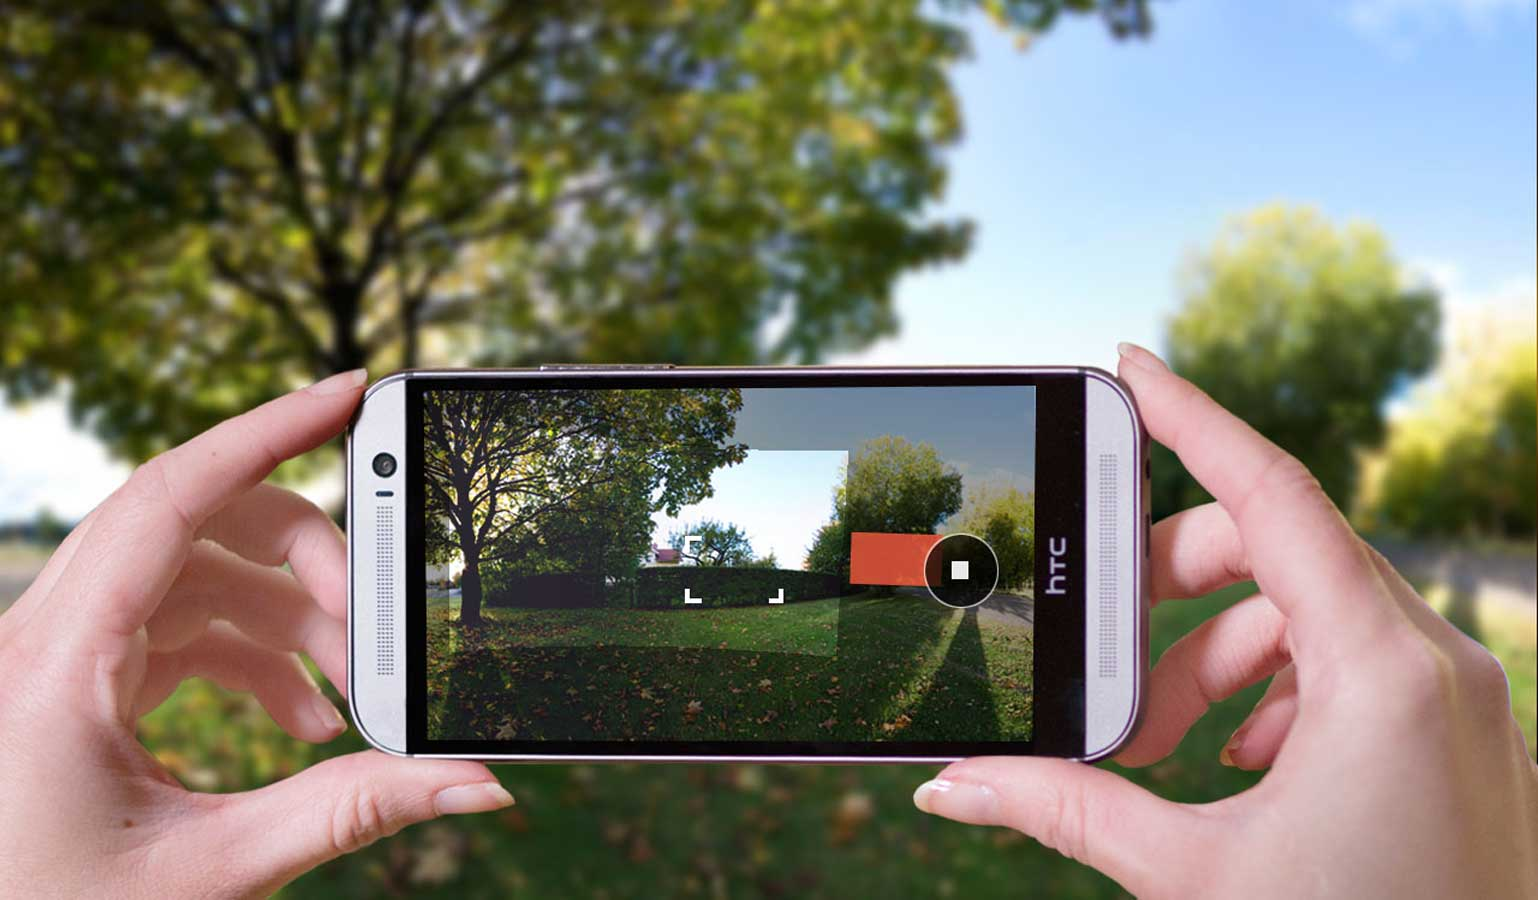 HTC One M8 Kamera Sorunu HTC One M8 Kamera Ayarları HTC One M8 Kamera Ayarları Düzeltme htc one m8 kamera sorunu